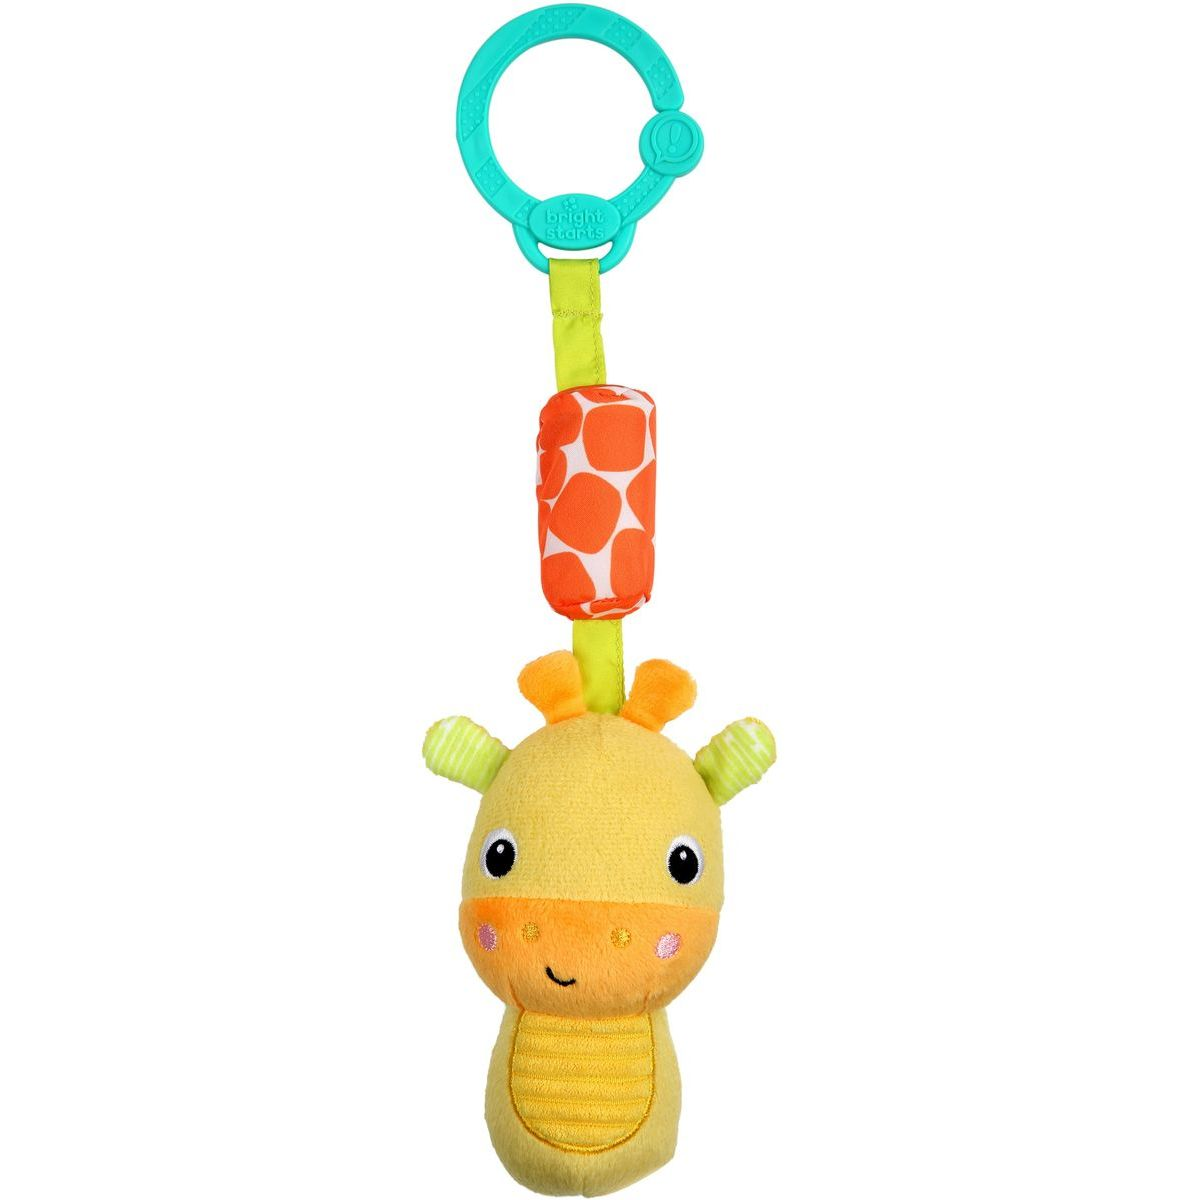 Bright Starts Hračka plyšová chrastítko na C kroužku Chime Along Friends žirafa